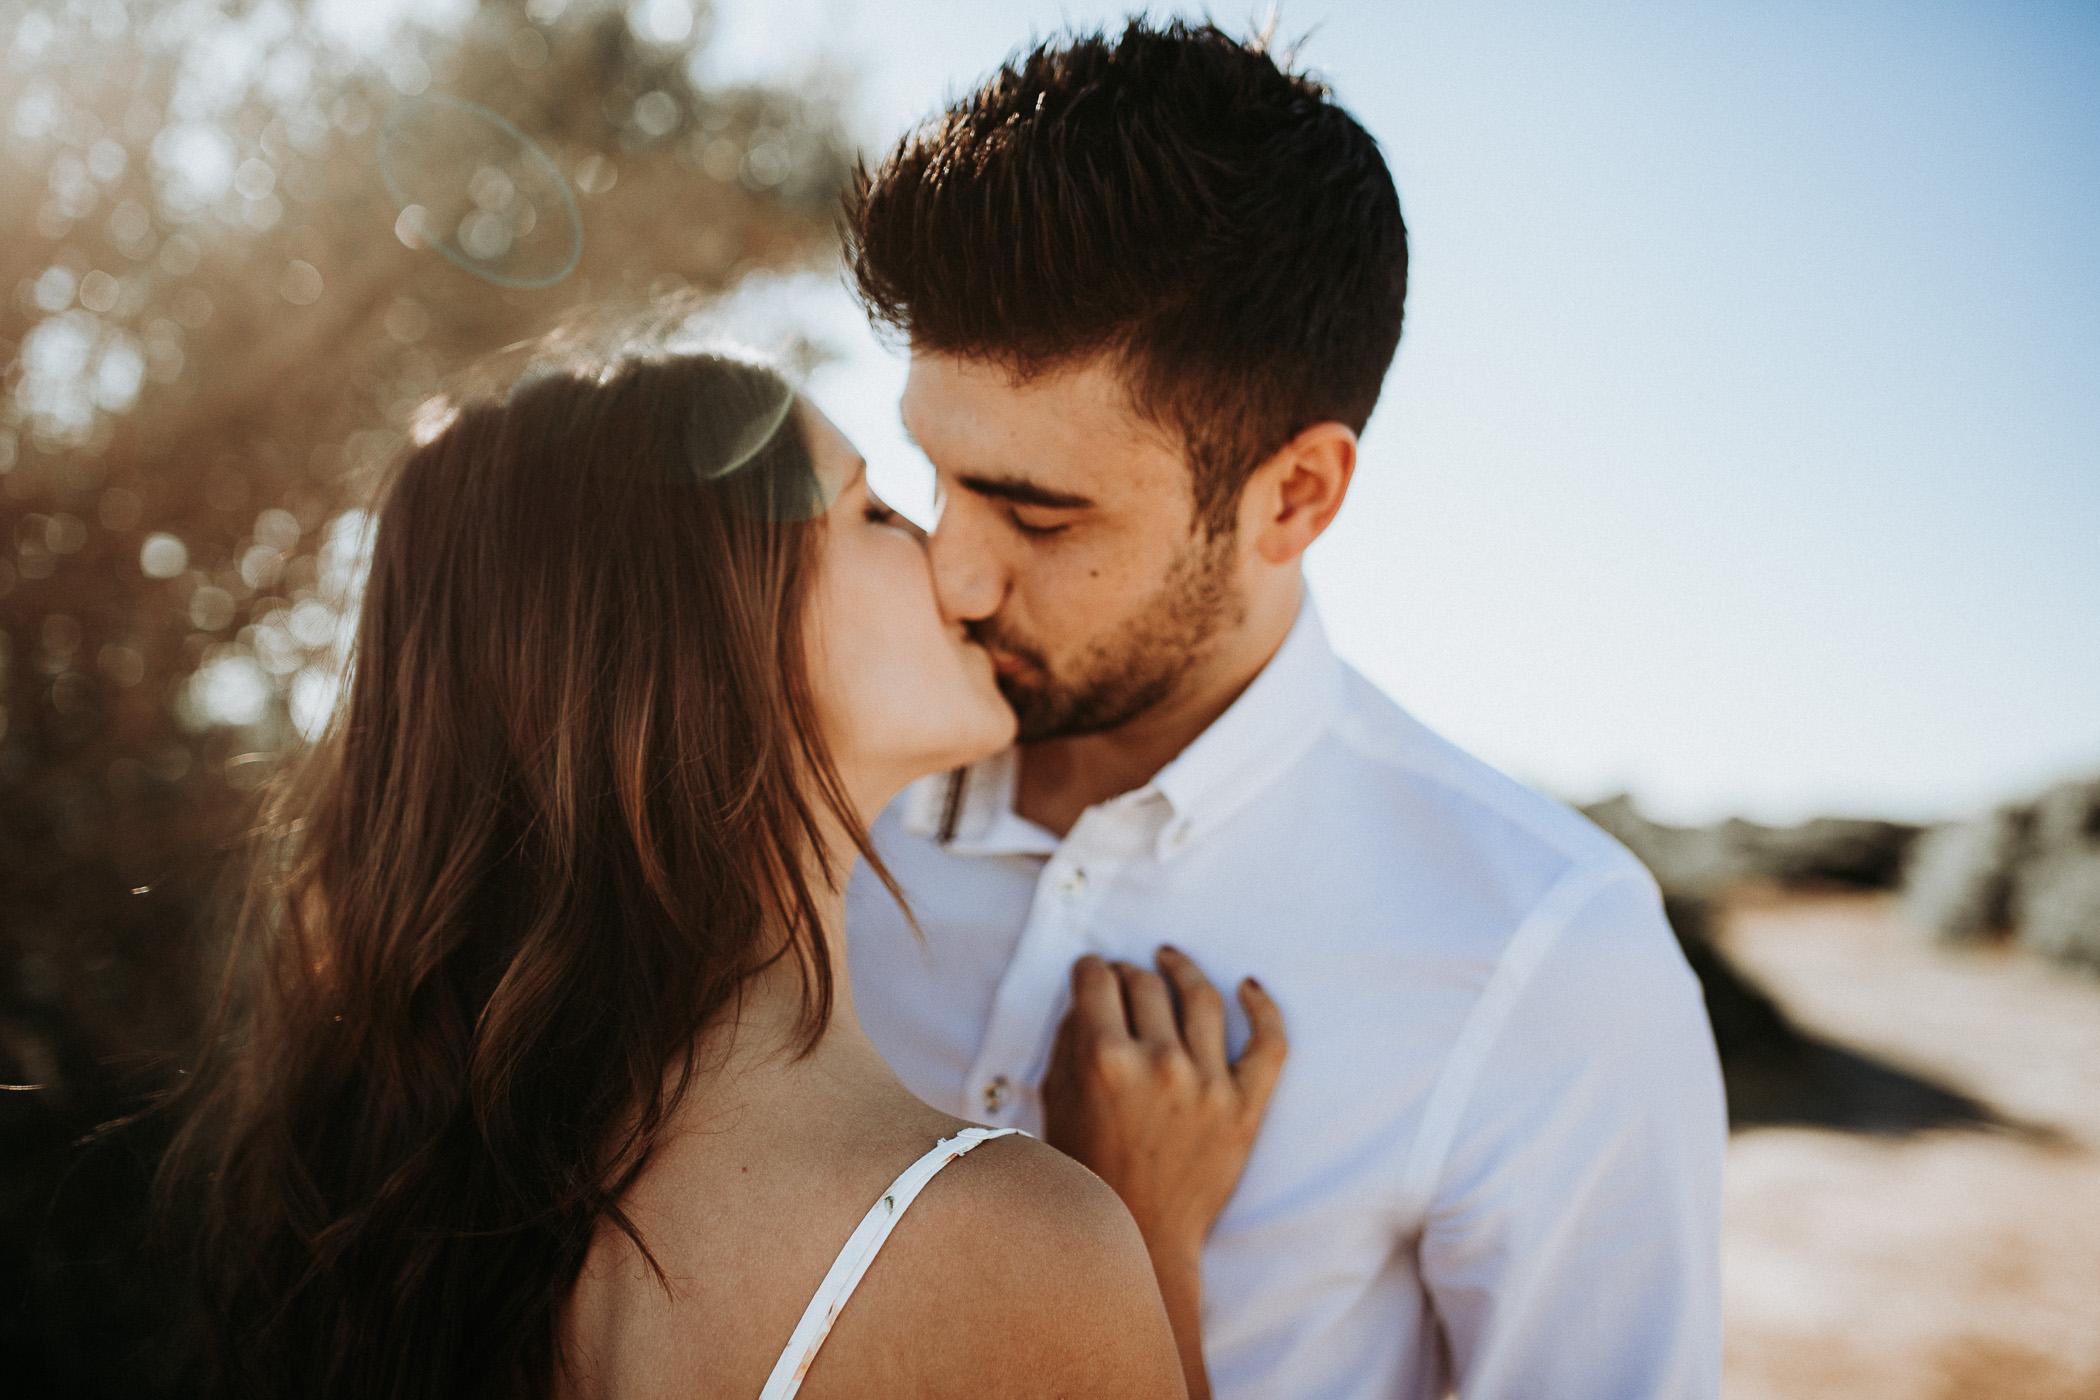 DanielaMarquardtPhotography_wedding_elopement_mallorca_spain_calapi_palma_lauraandtoni_53